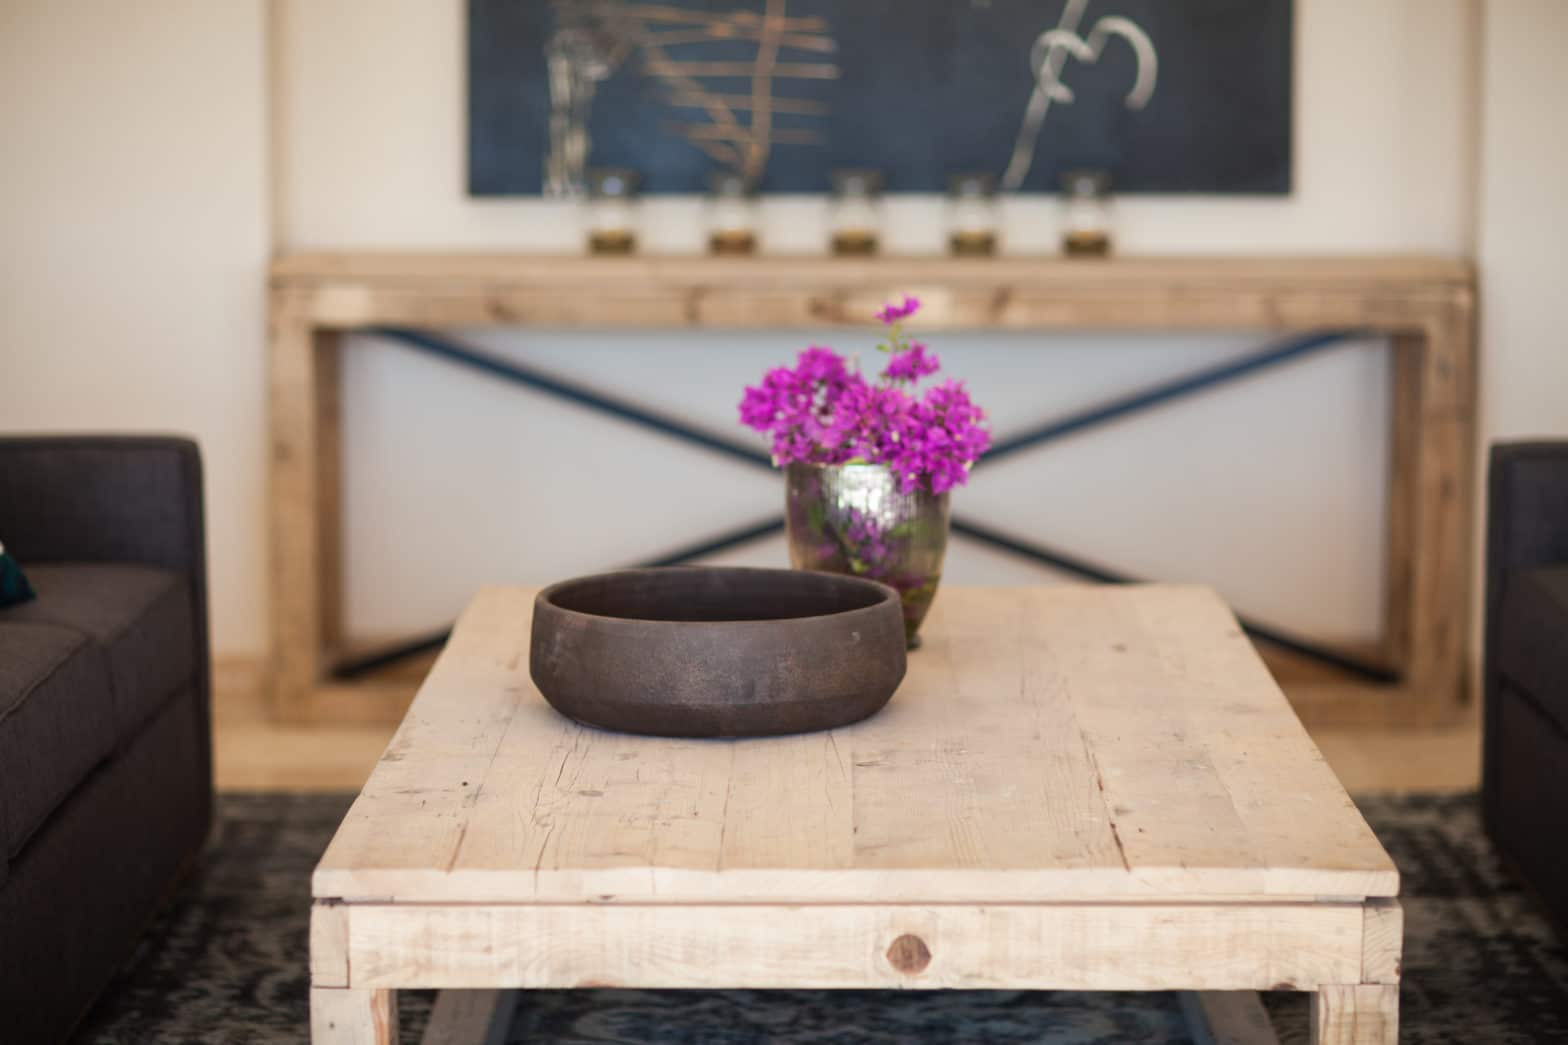 Fuschia Flowers on Wooden Kitchen Table